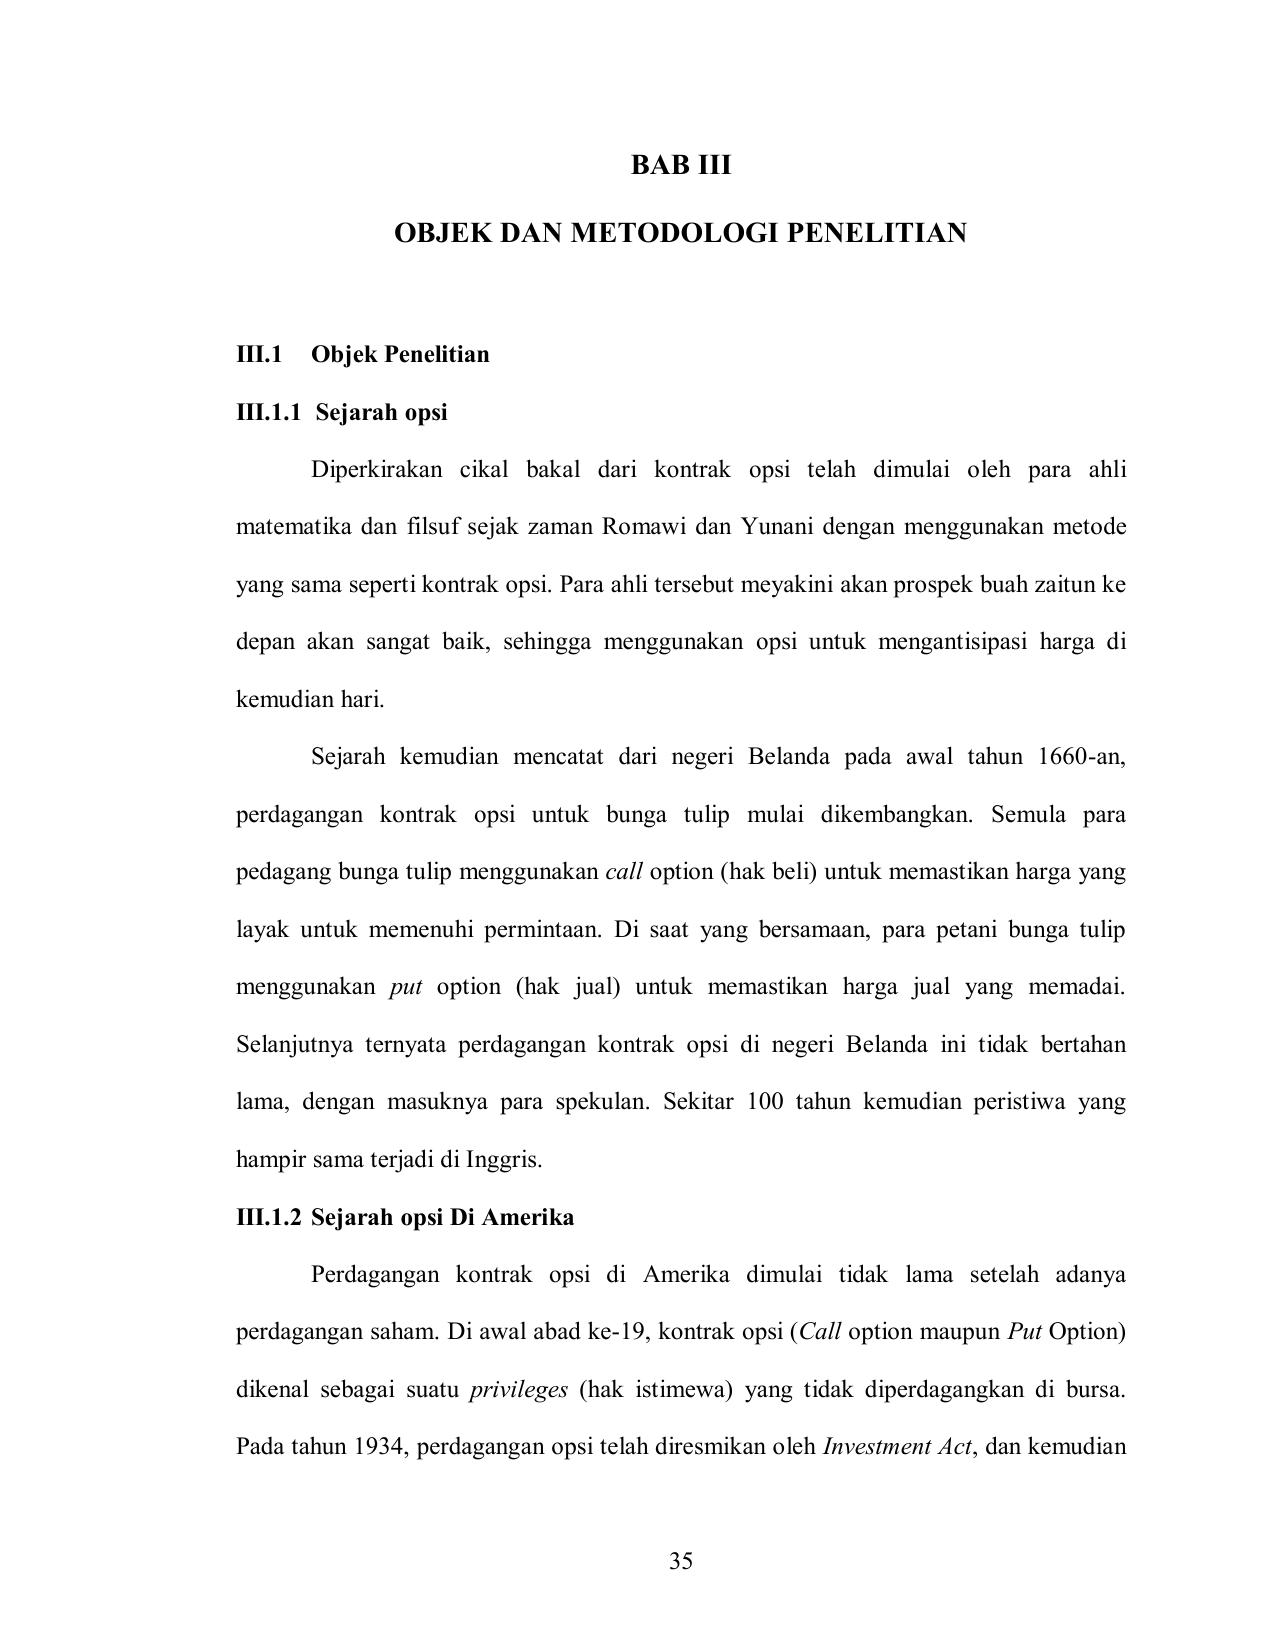 Puncak Forex Jakarta: Iq options strategies